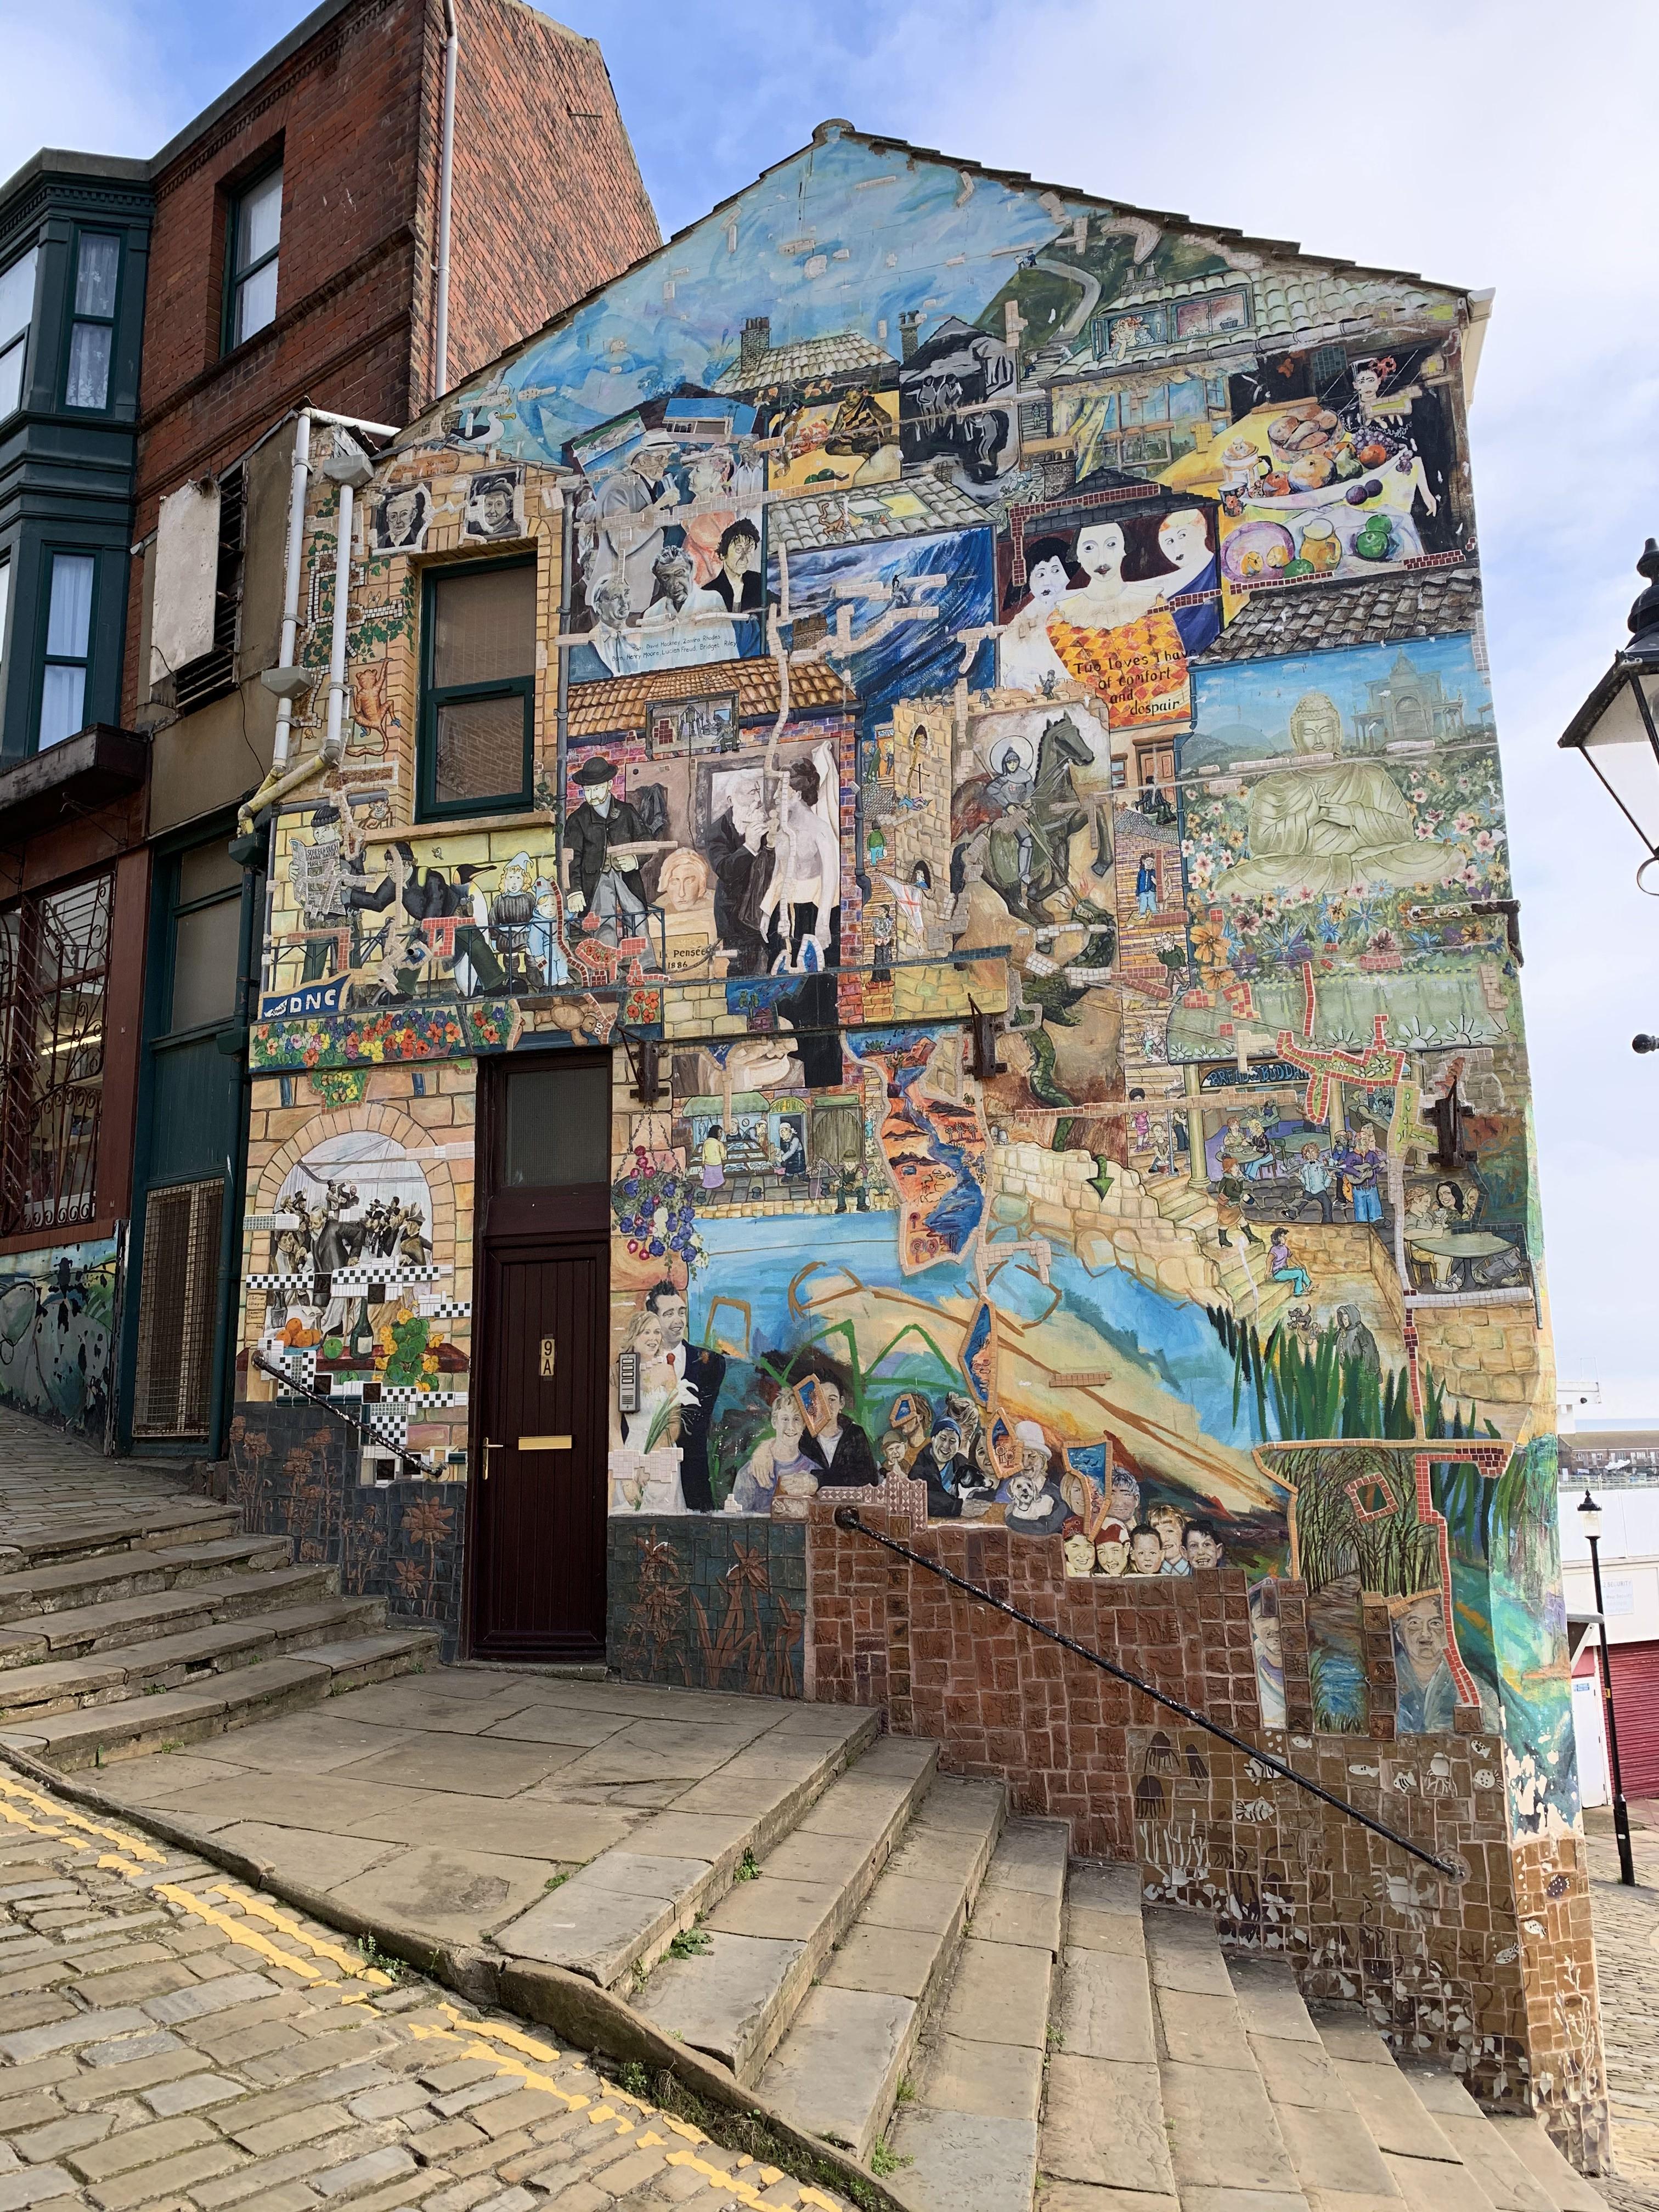 Street art in Scarborough, England